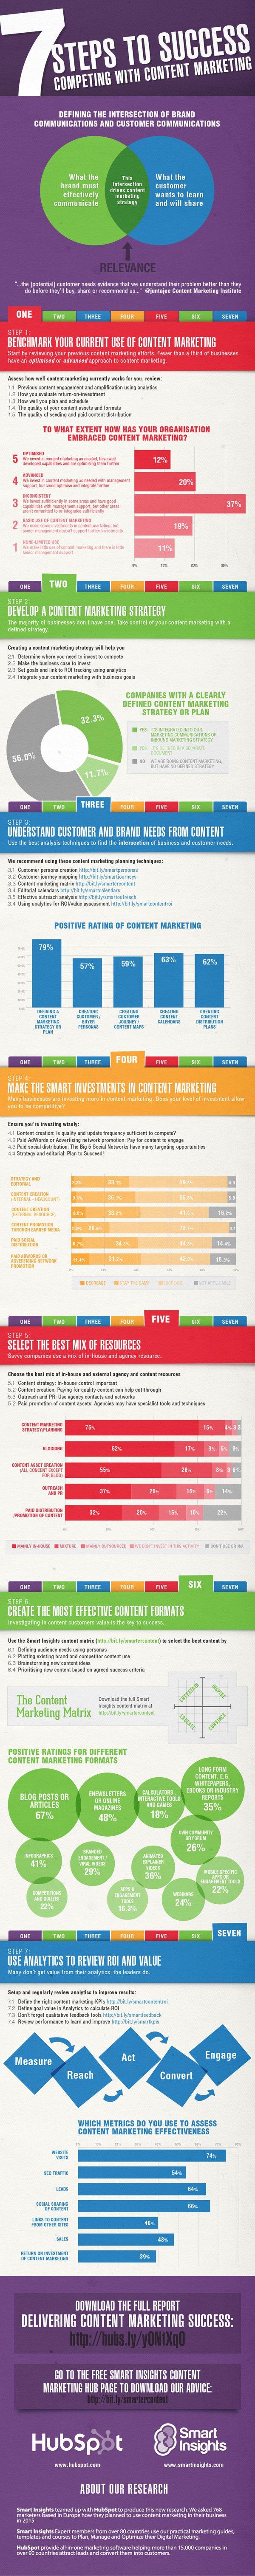 Content-Marketing-success-survey.jpg